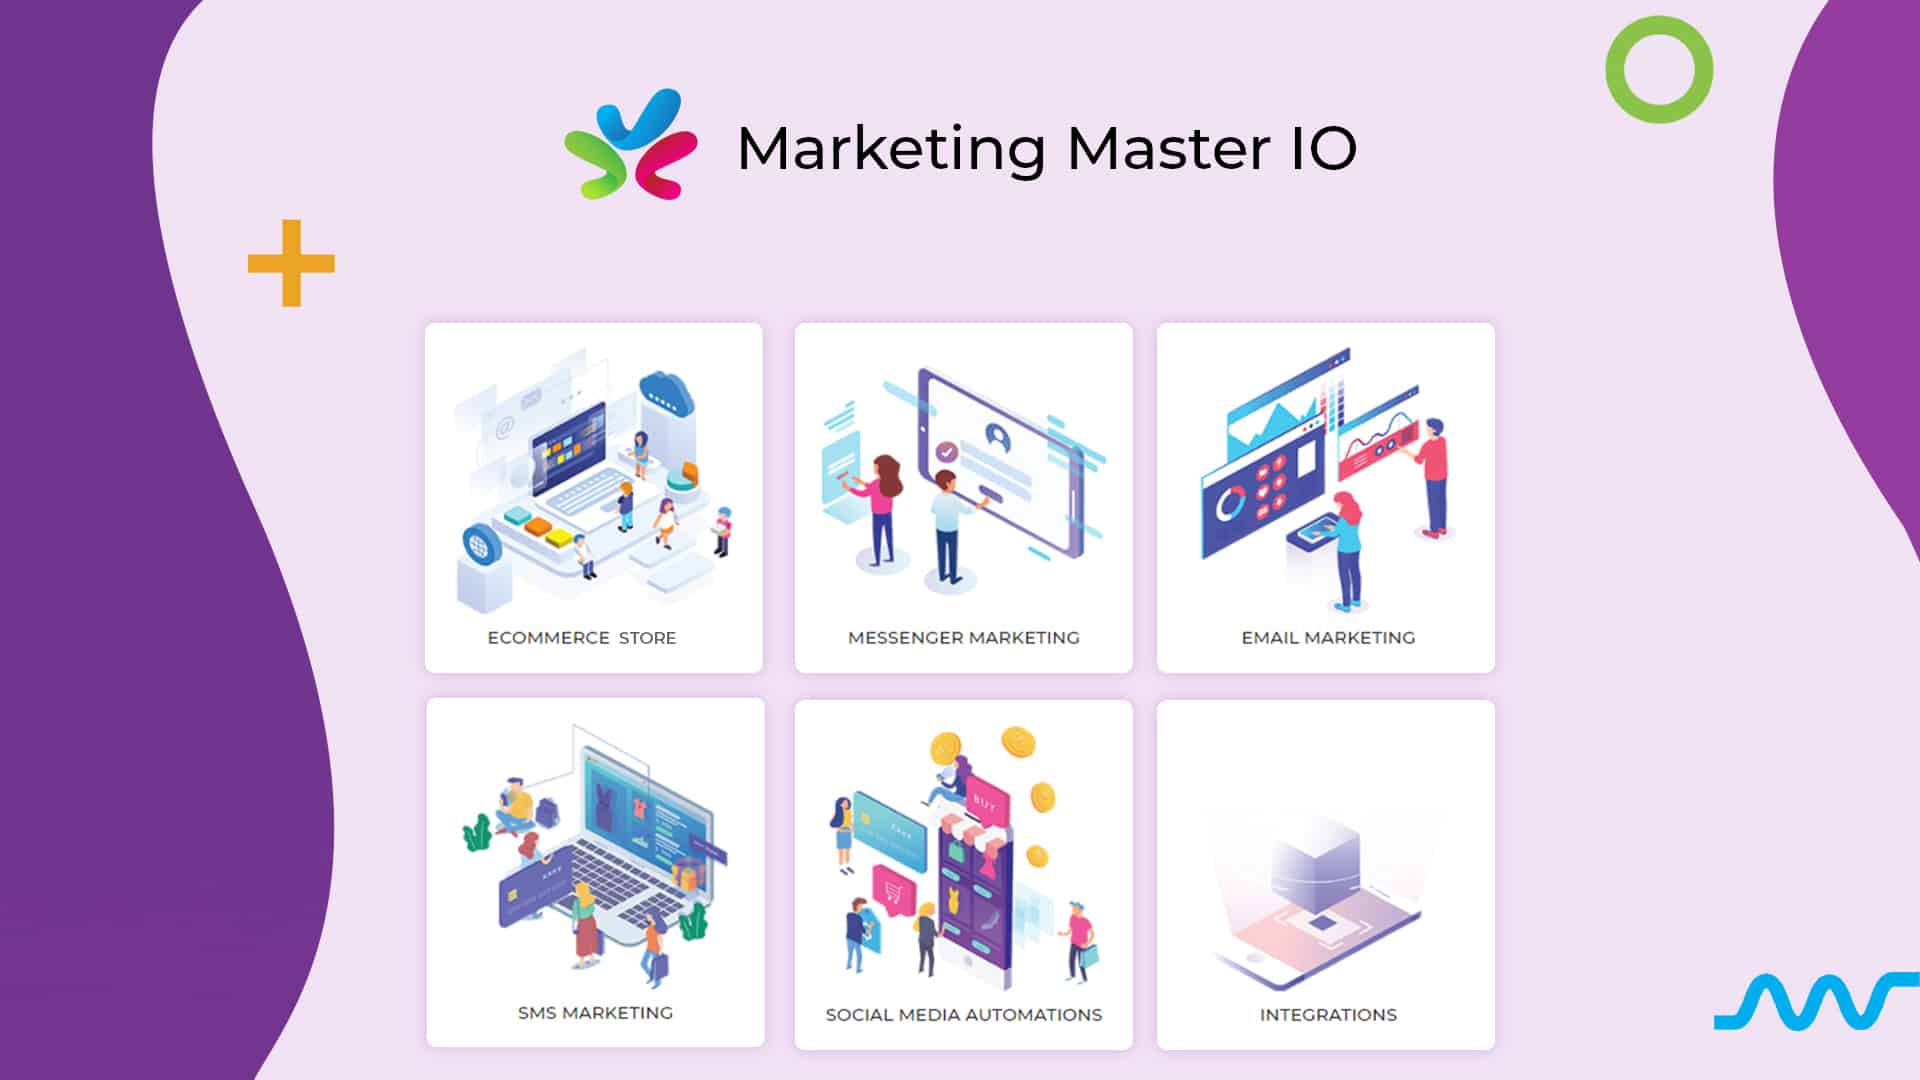 Marketing Master